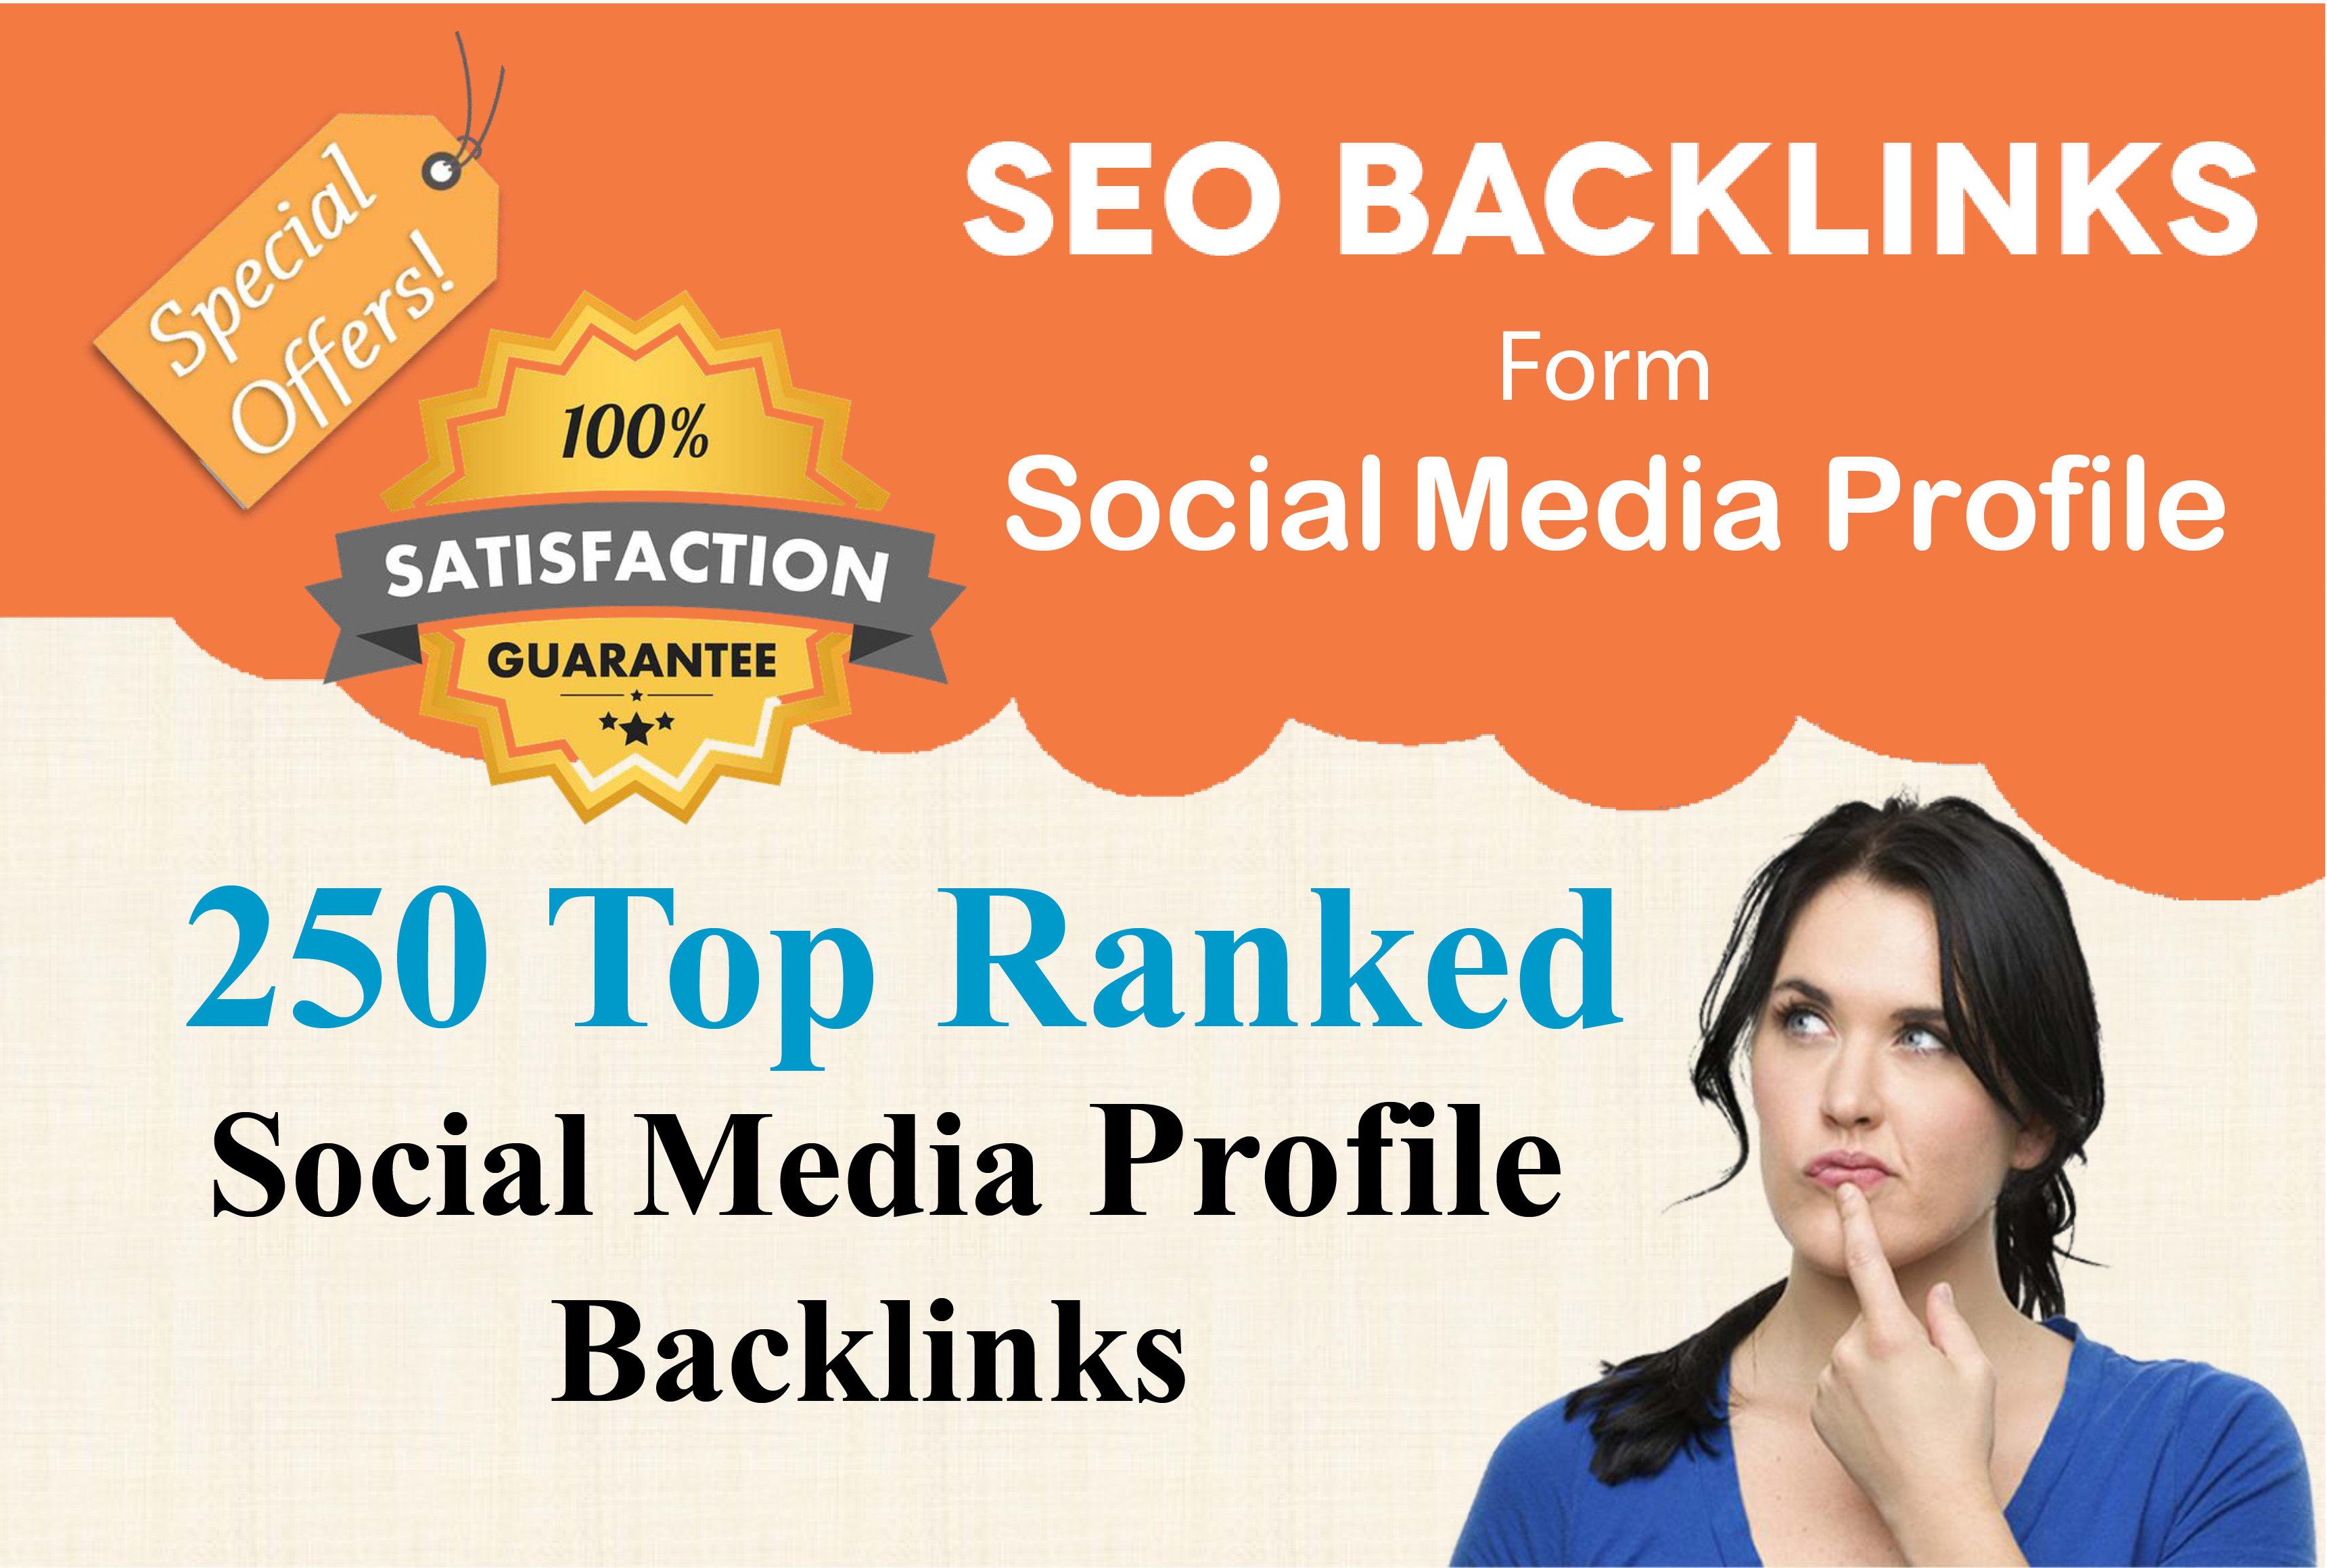 I will create 250 high the social media profiles backlinks